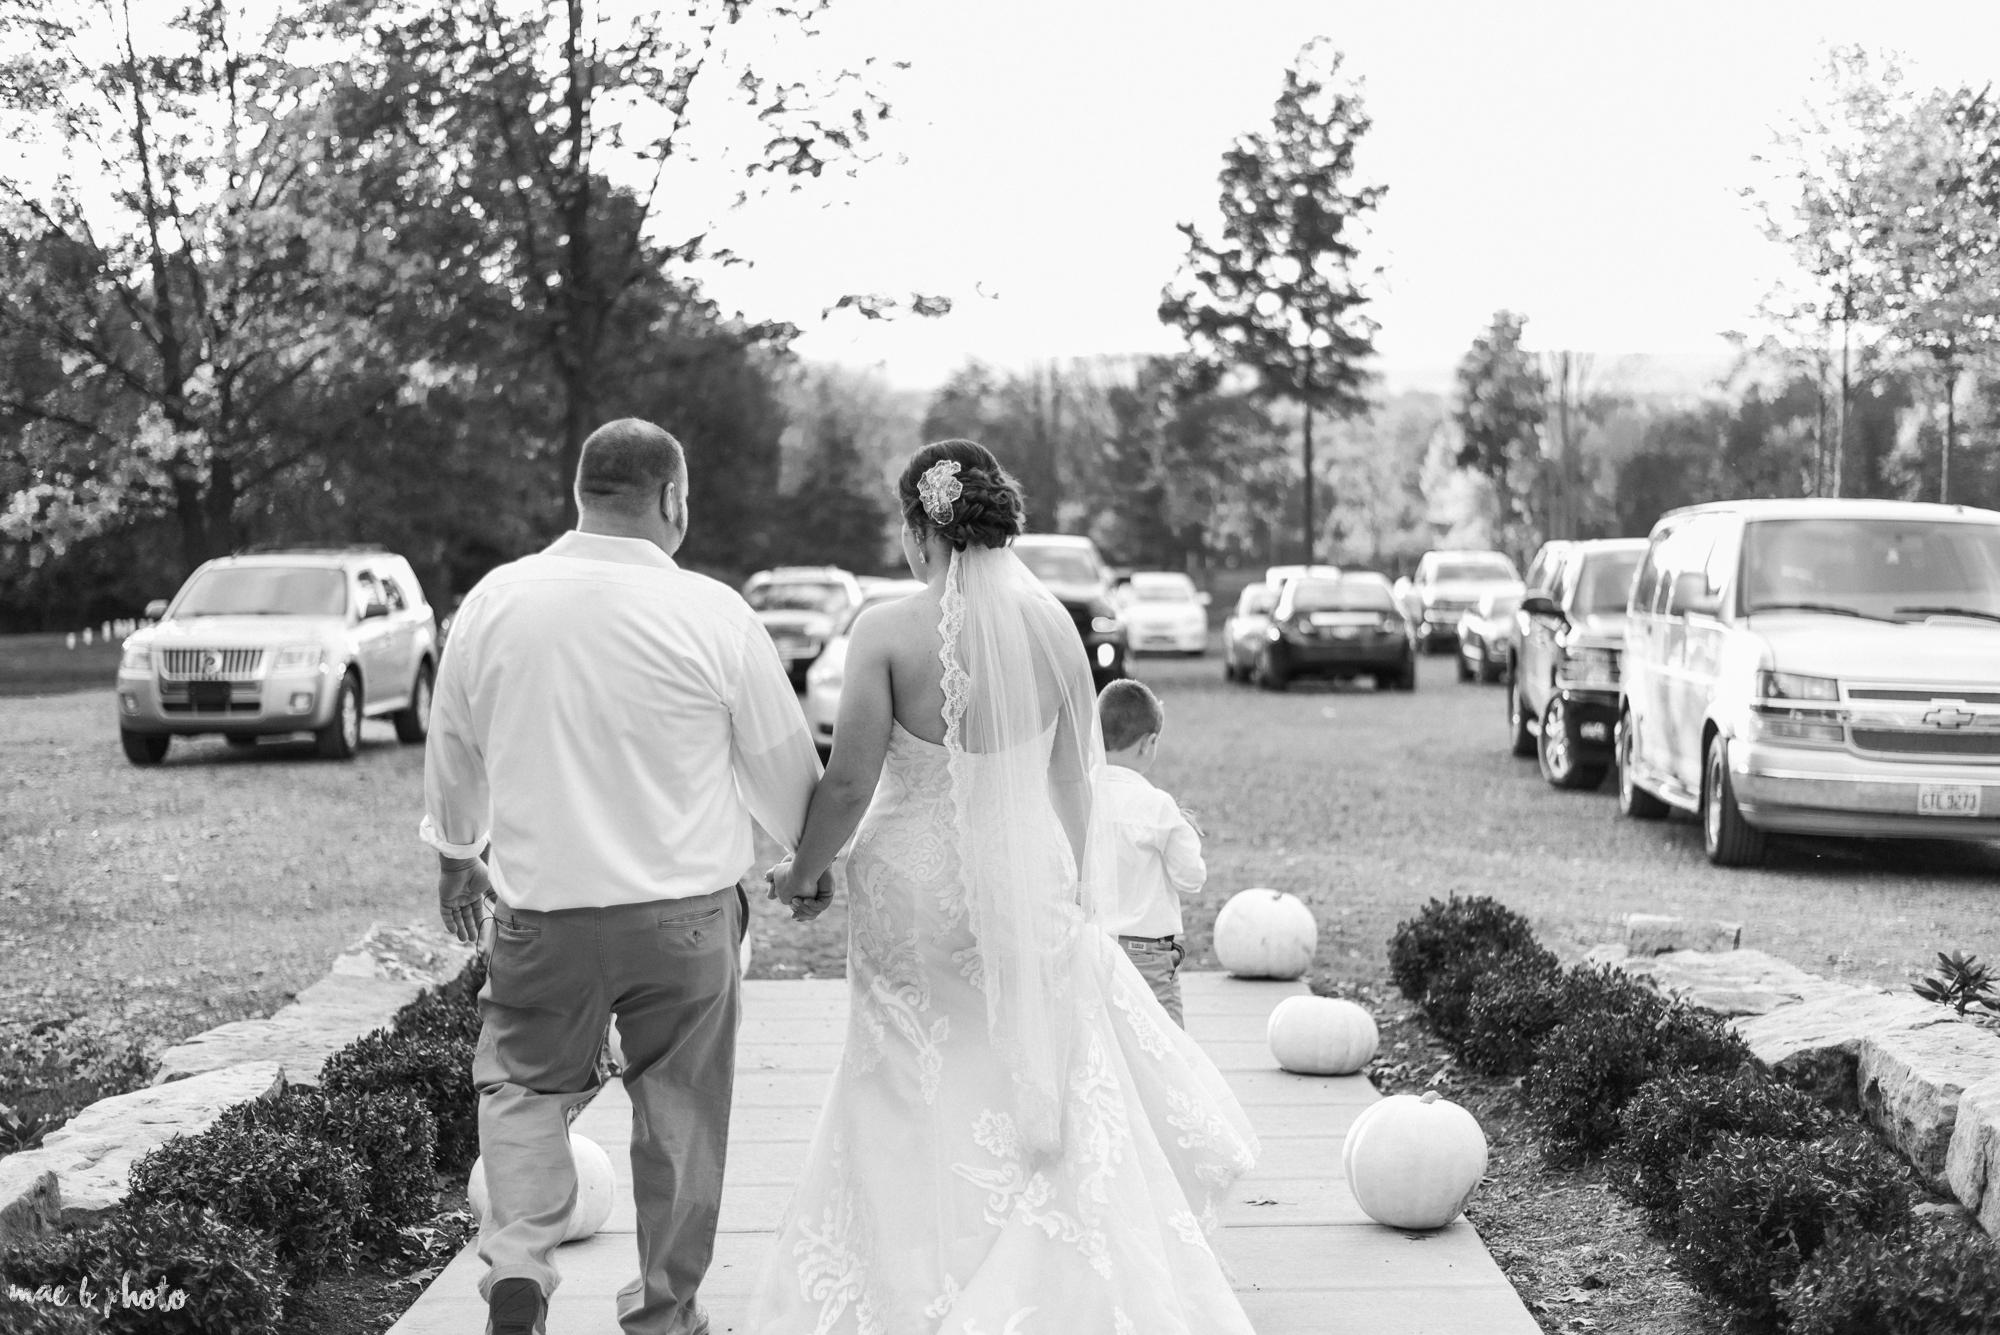 Sarah & Dustin's Rustic Chic Barn Wedding at Hartford Hill Winery in Hartford, Ohio by Mae B Photo-50.jpg